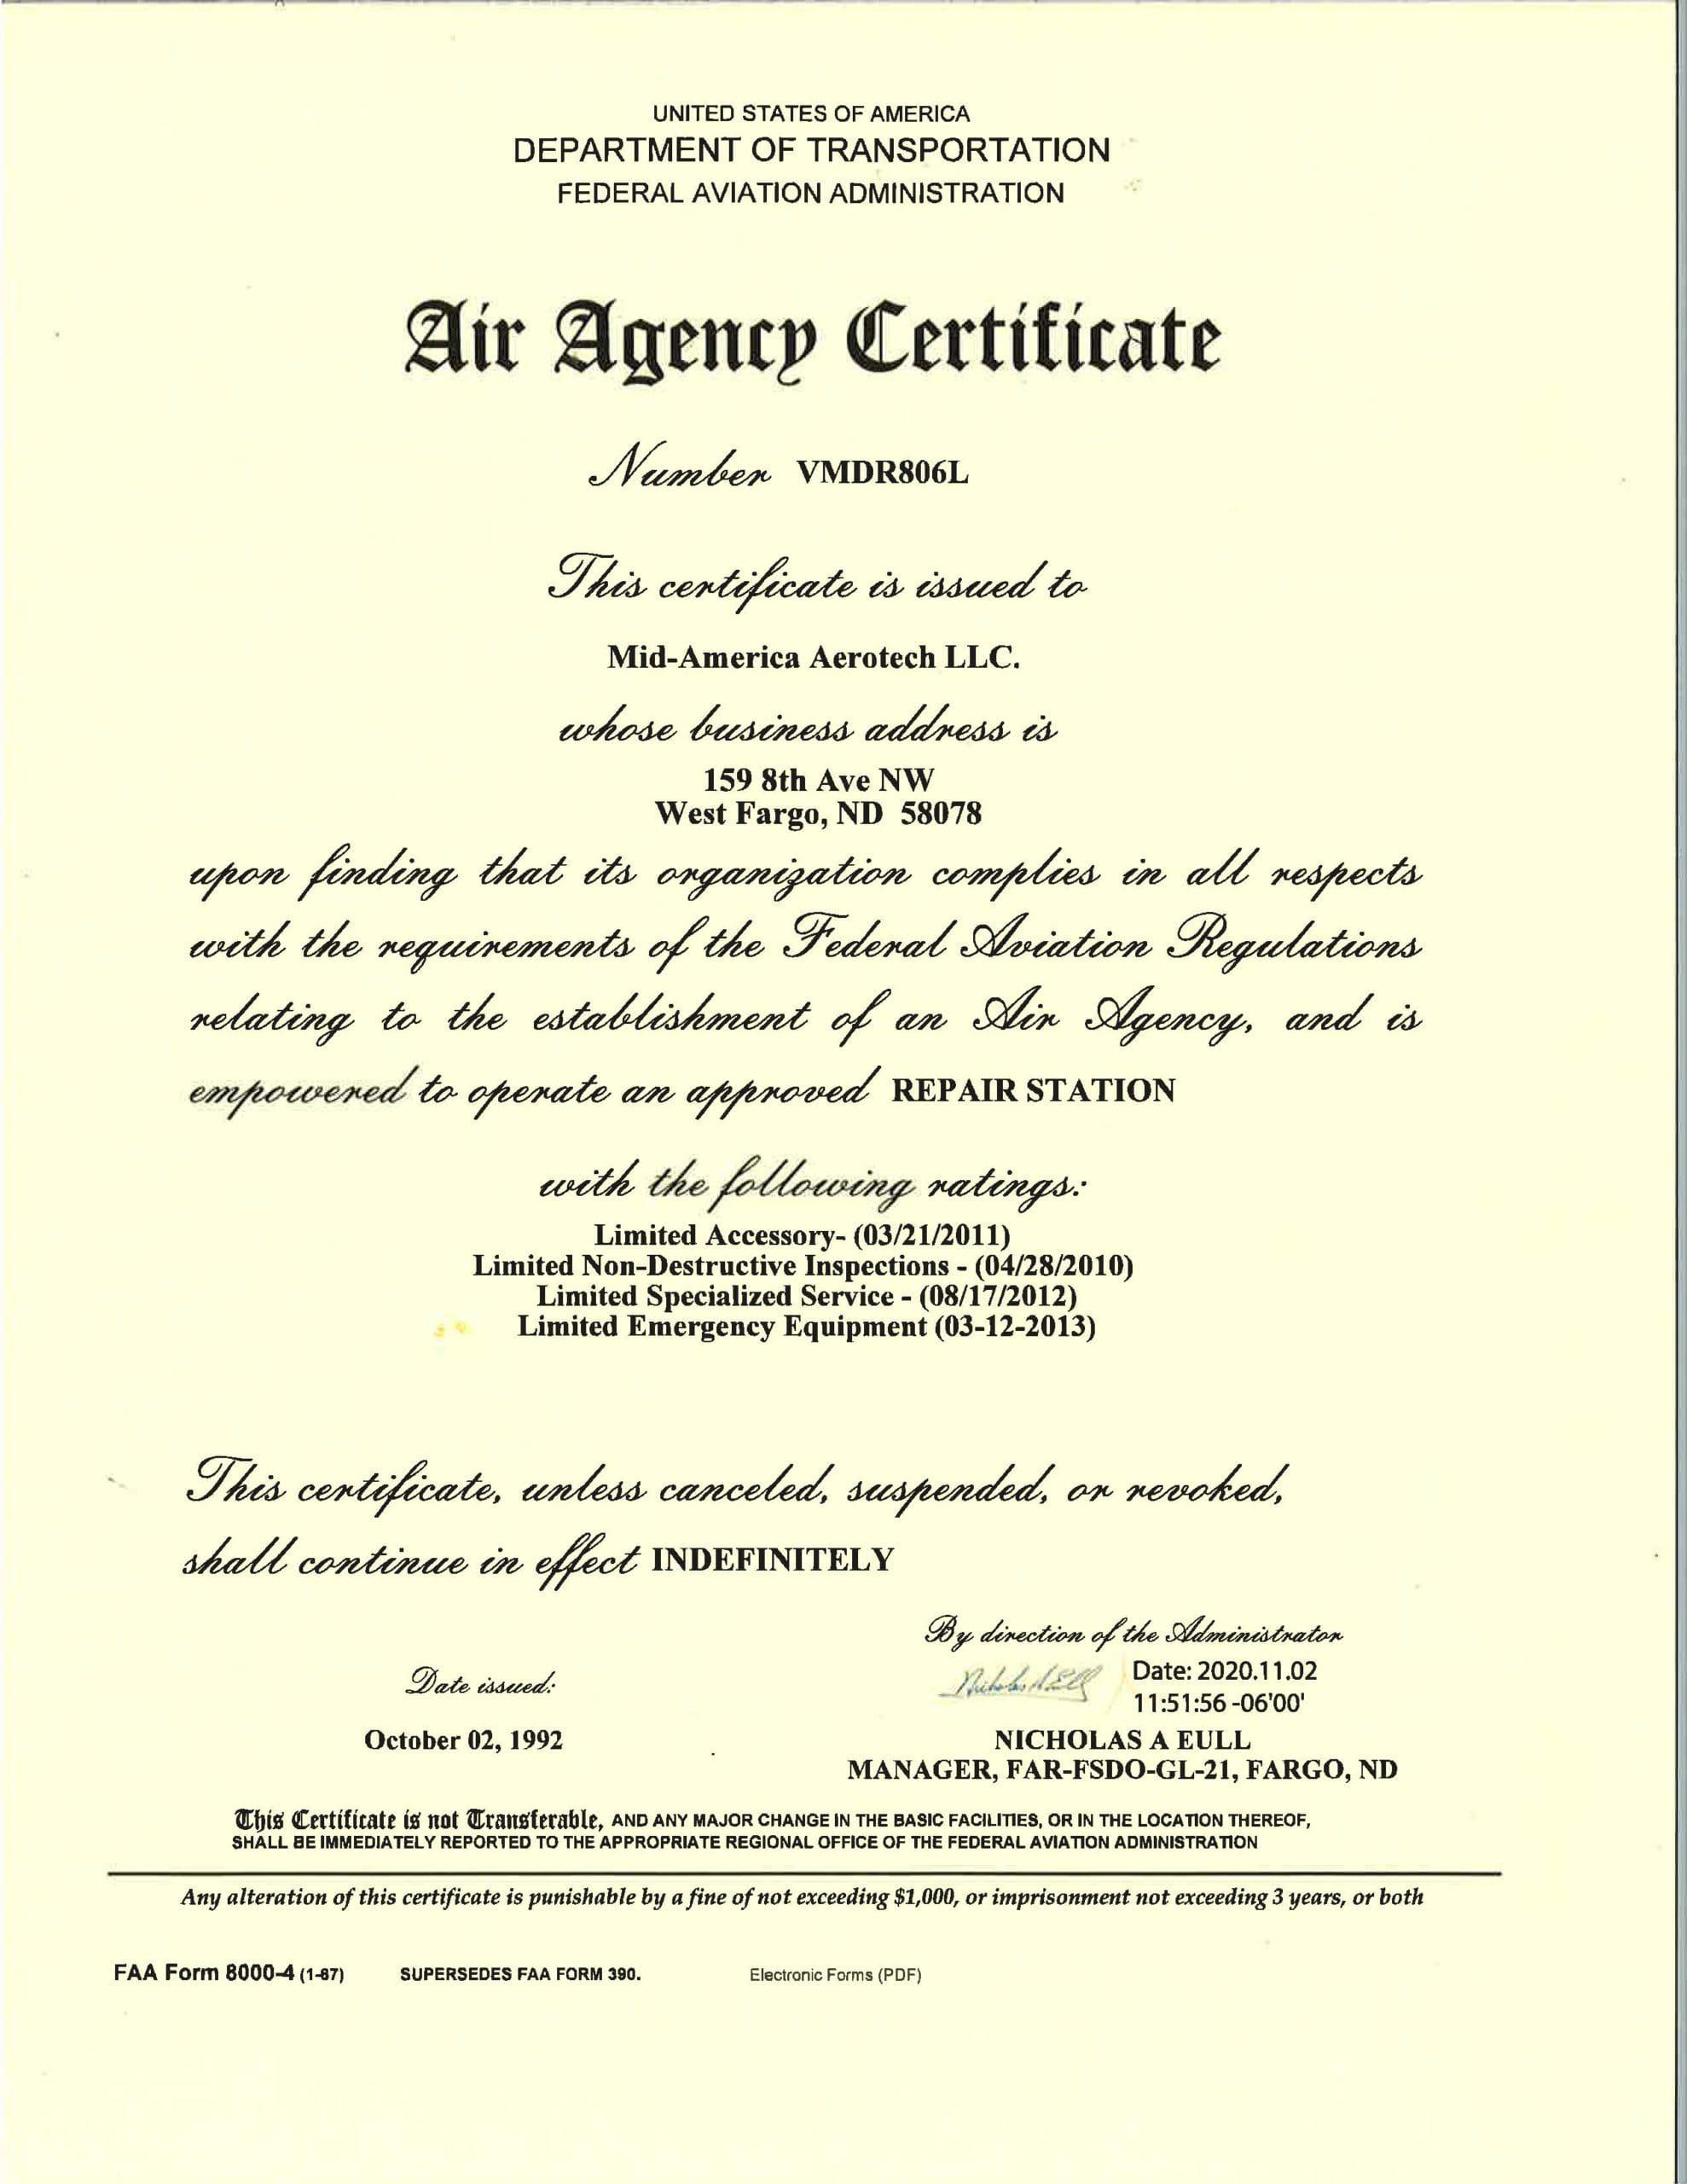 MAA Air Agency Certificate VMDR806L